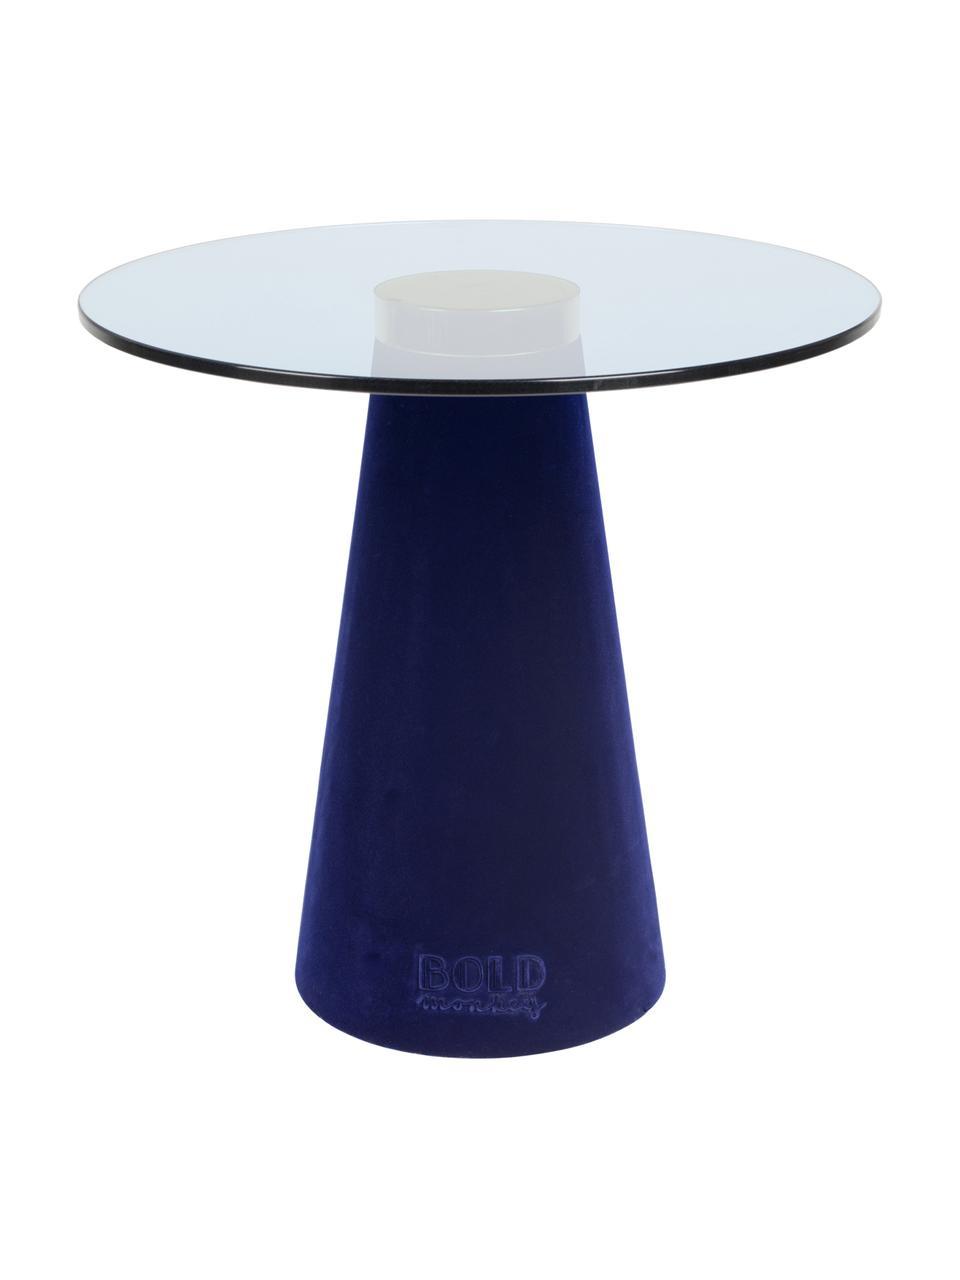 Table d'appoint en verre Leader Of The Fanclub, Bleu